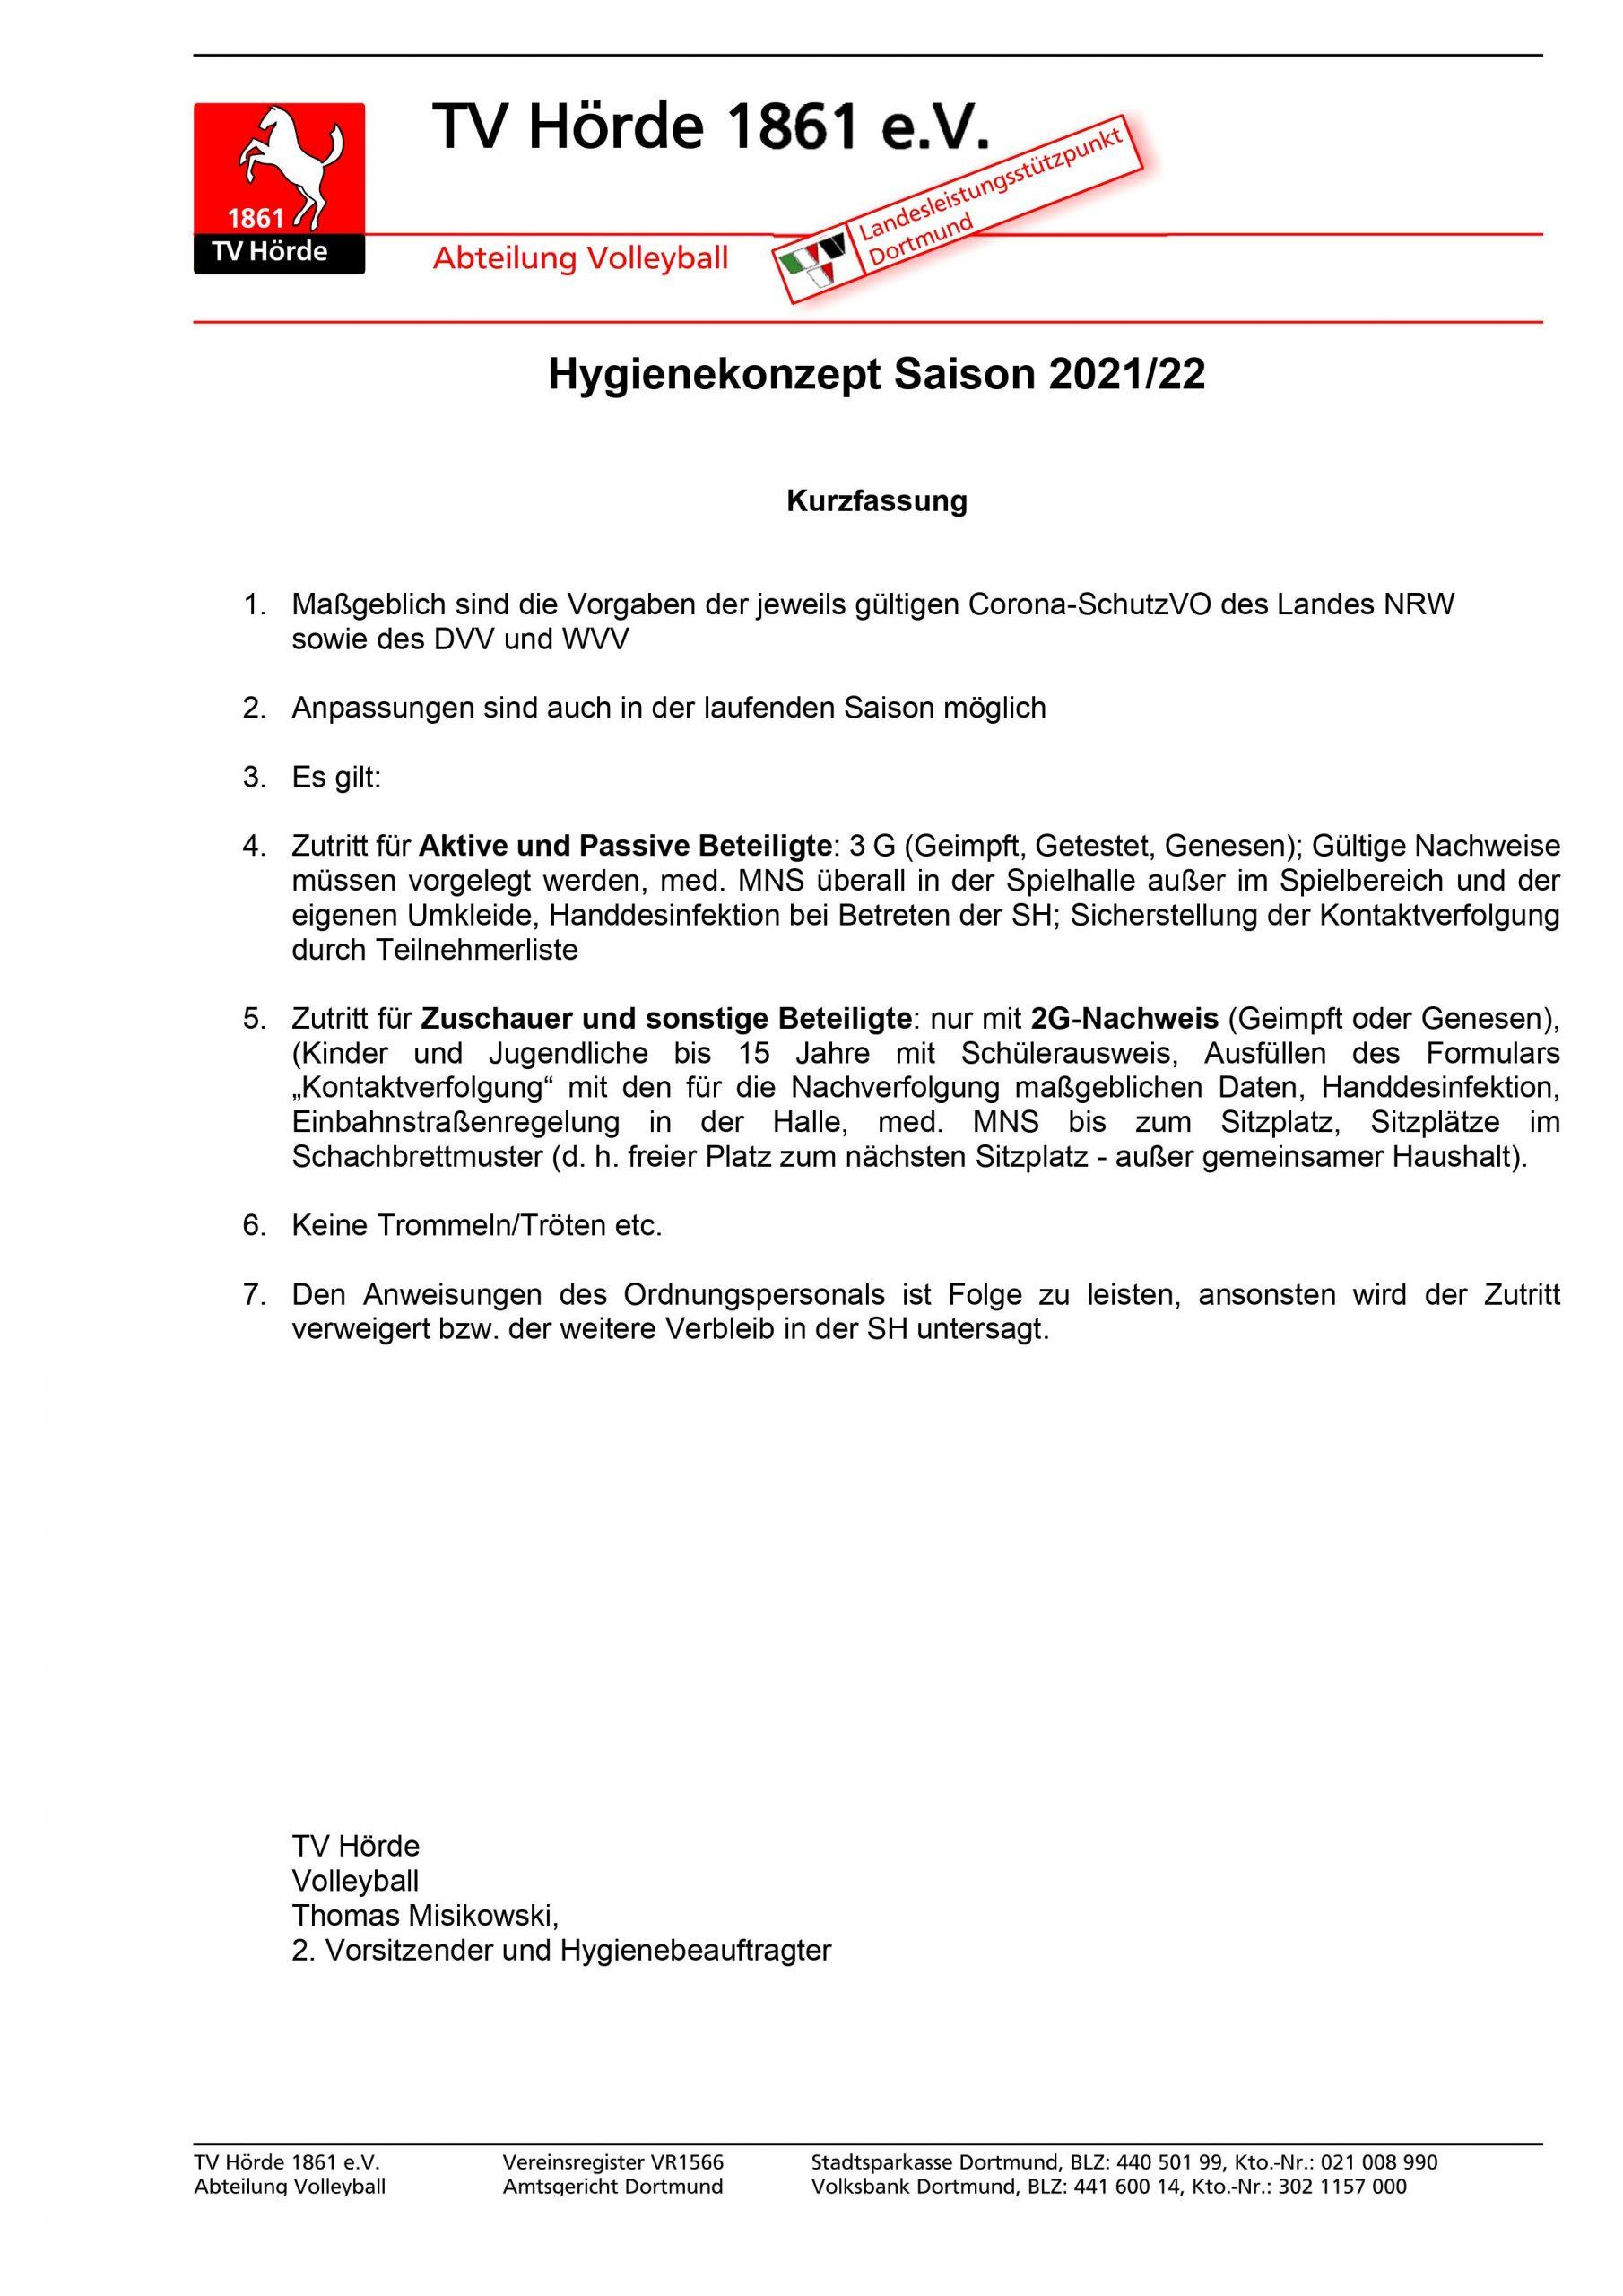 Hygienekonzept Saison 2021-22-WVV-Ligen